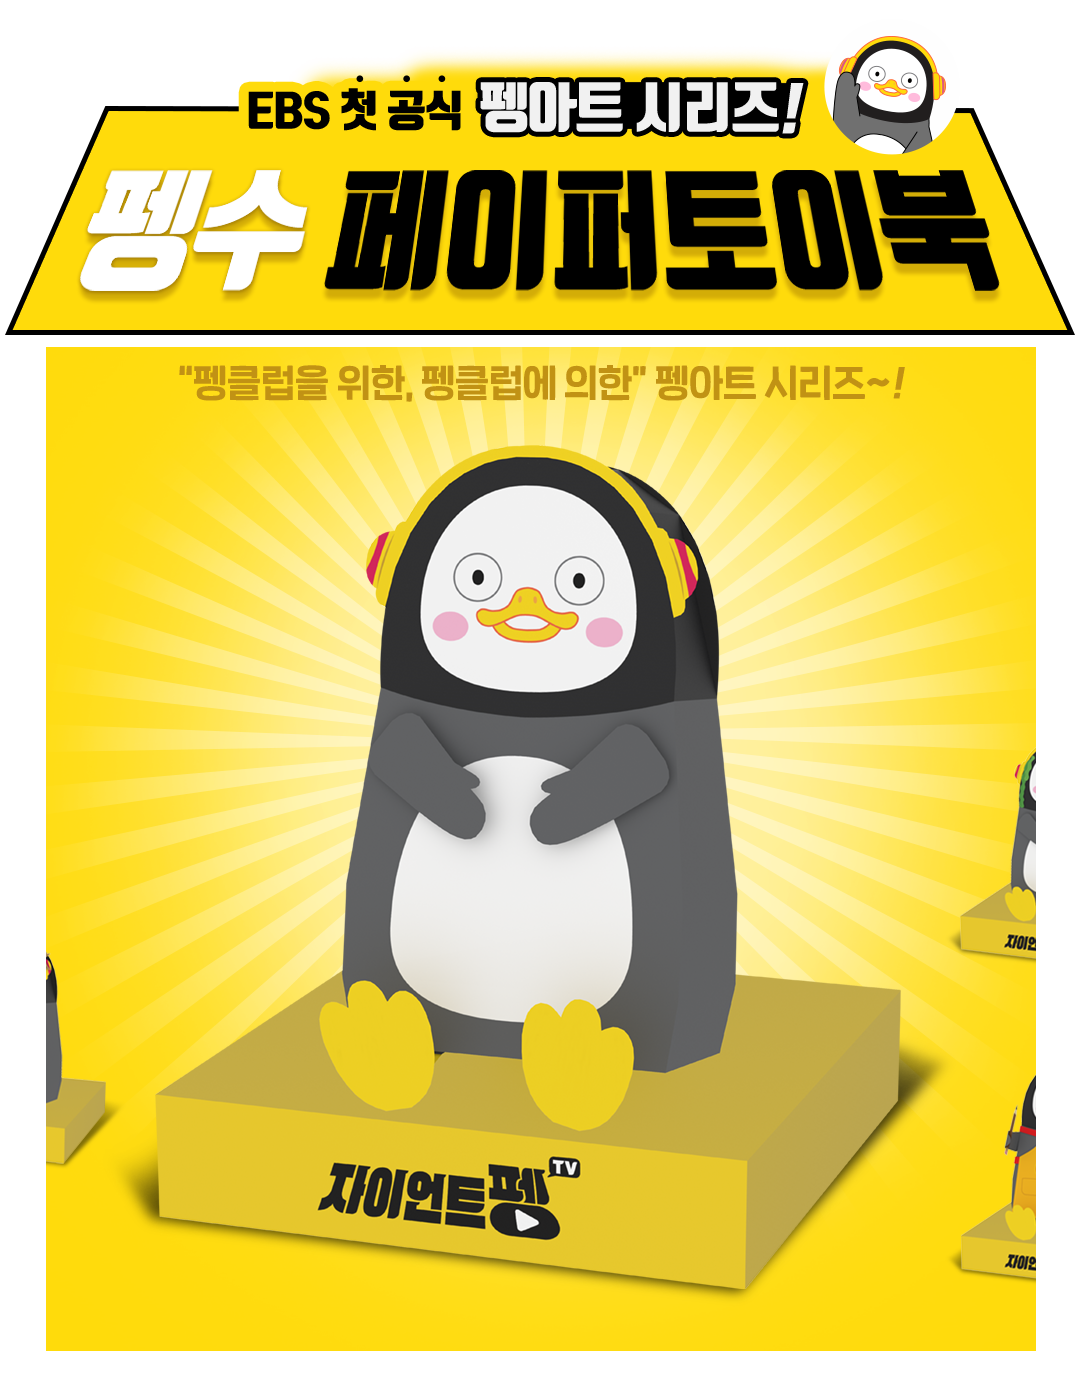 EBS 첫 공식 펭아트 시리즈! 펭수 페이퍼토이북. 펭클럽을 위한, 펭클럽에 의한 펭아트 시리즈~!